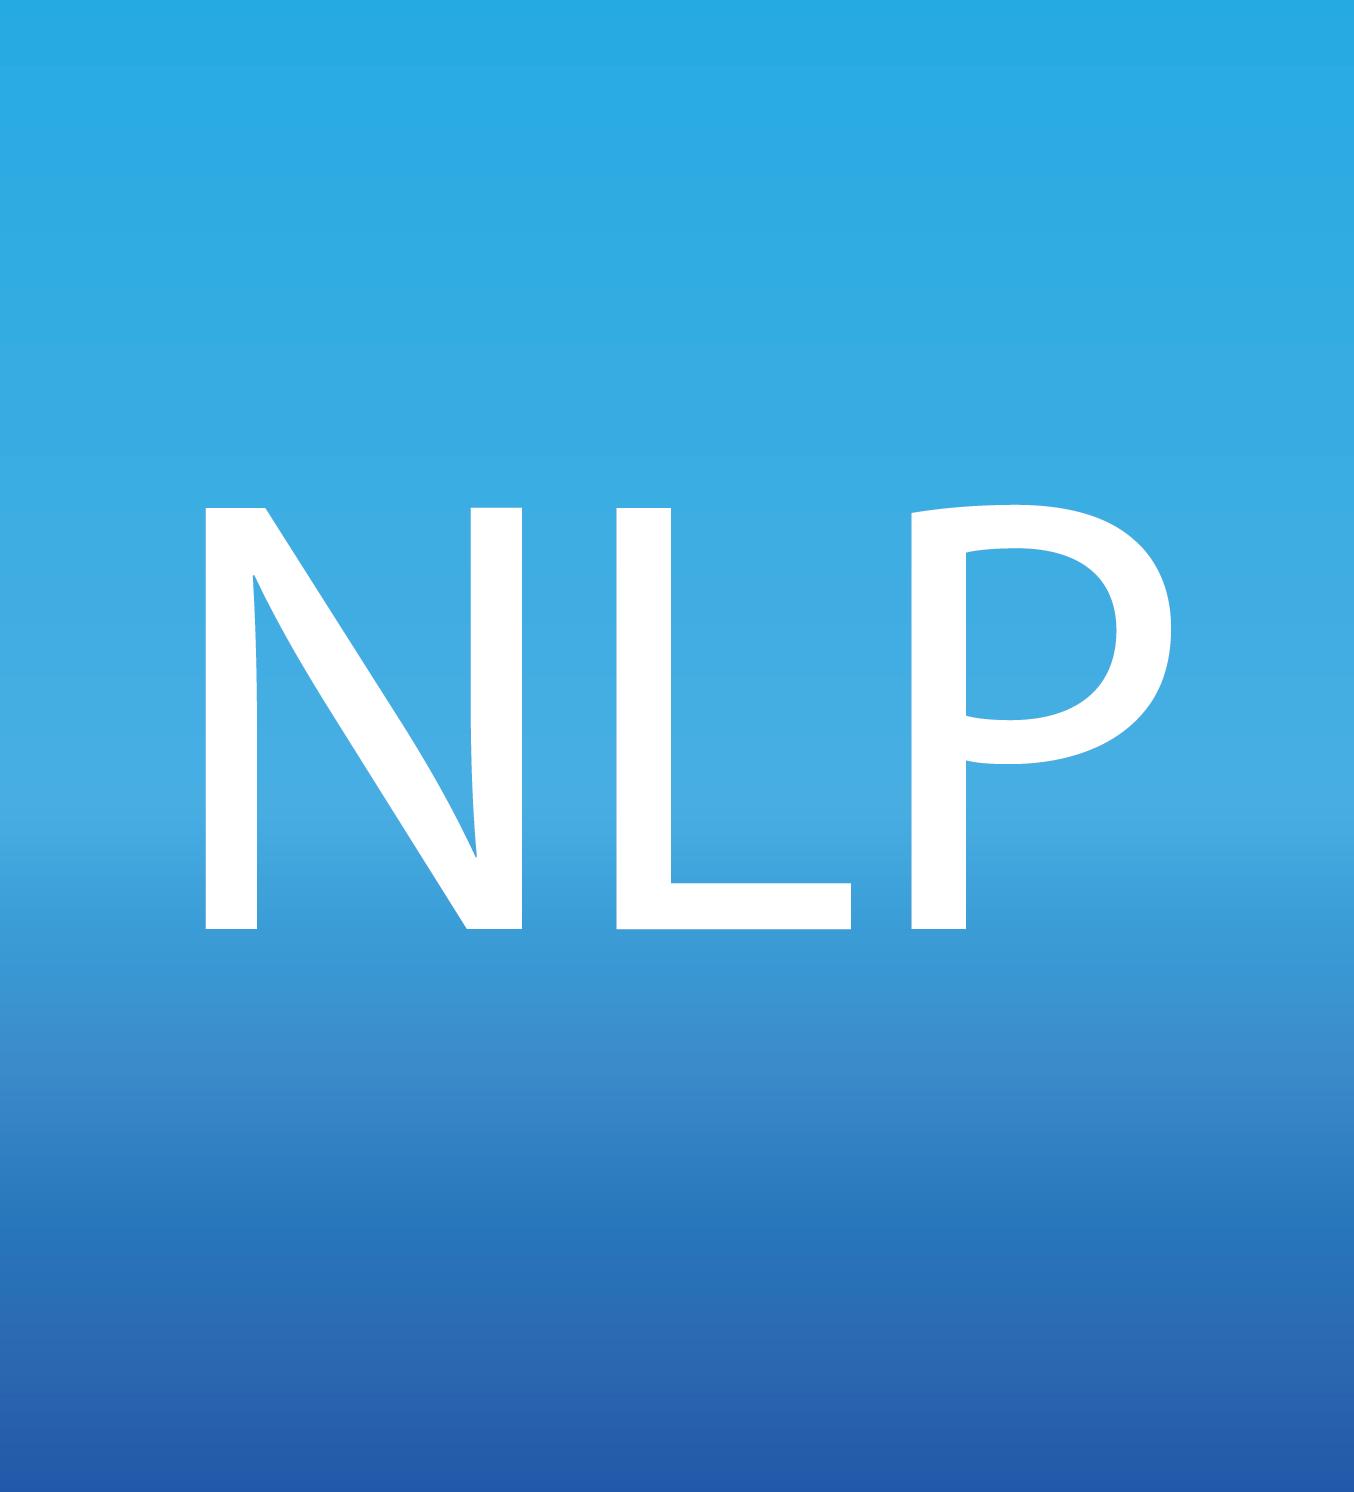 Natural Language Processing bio photo